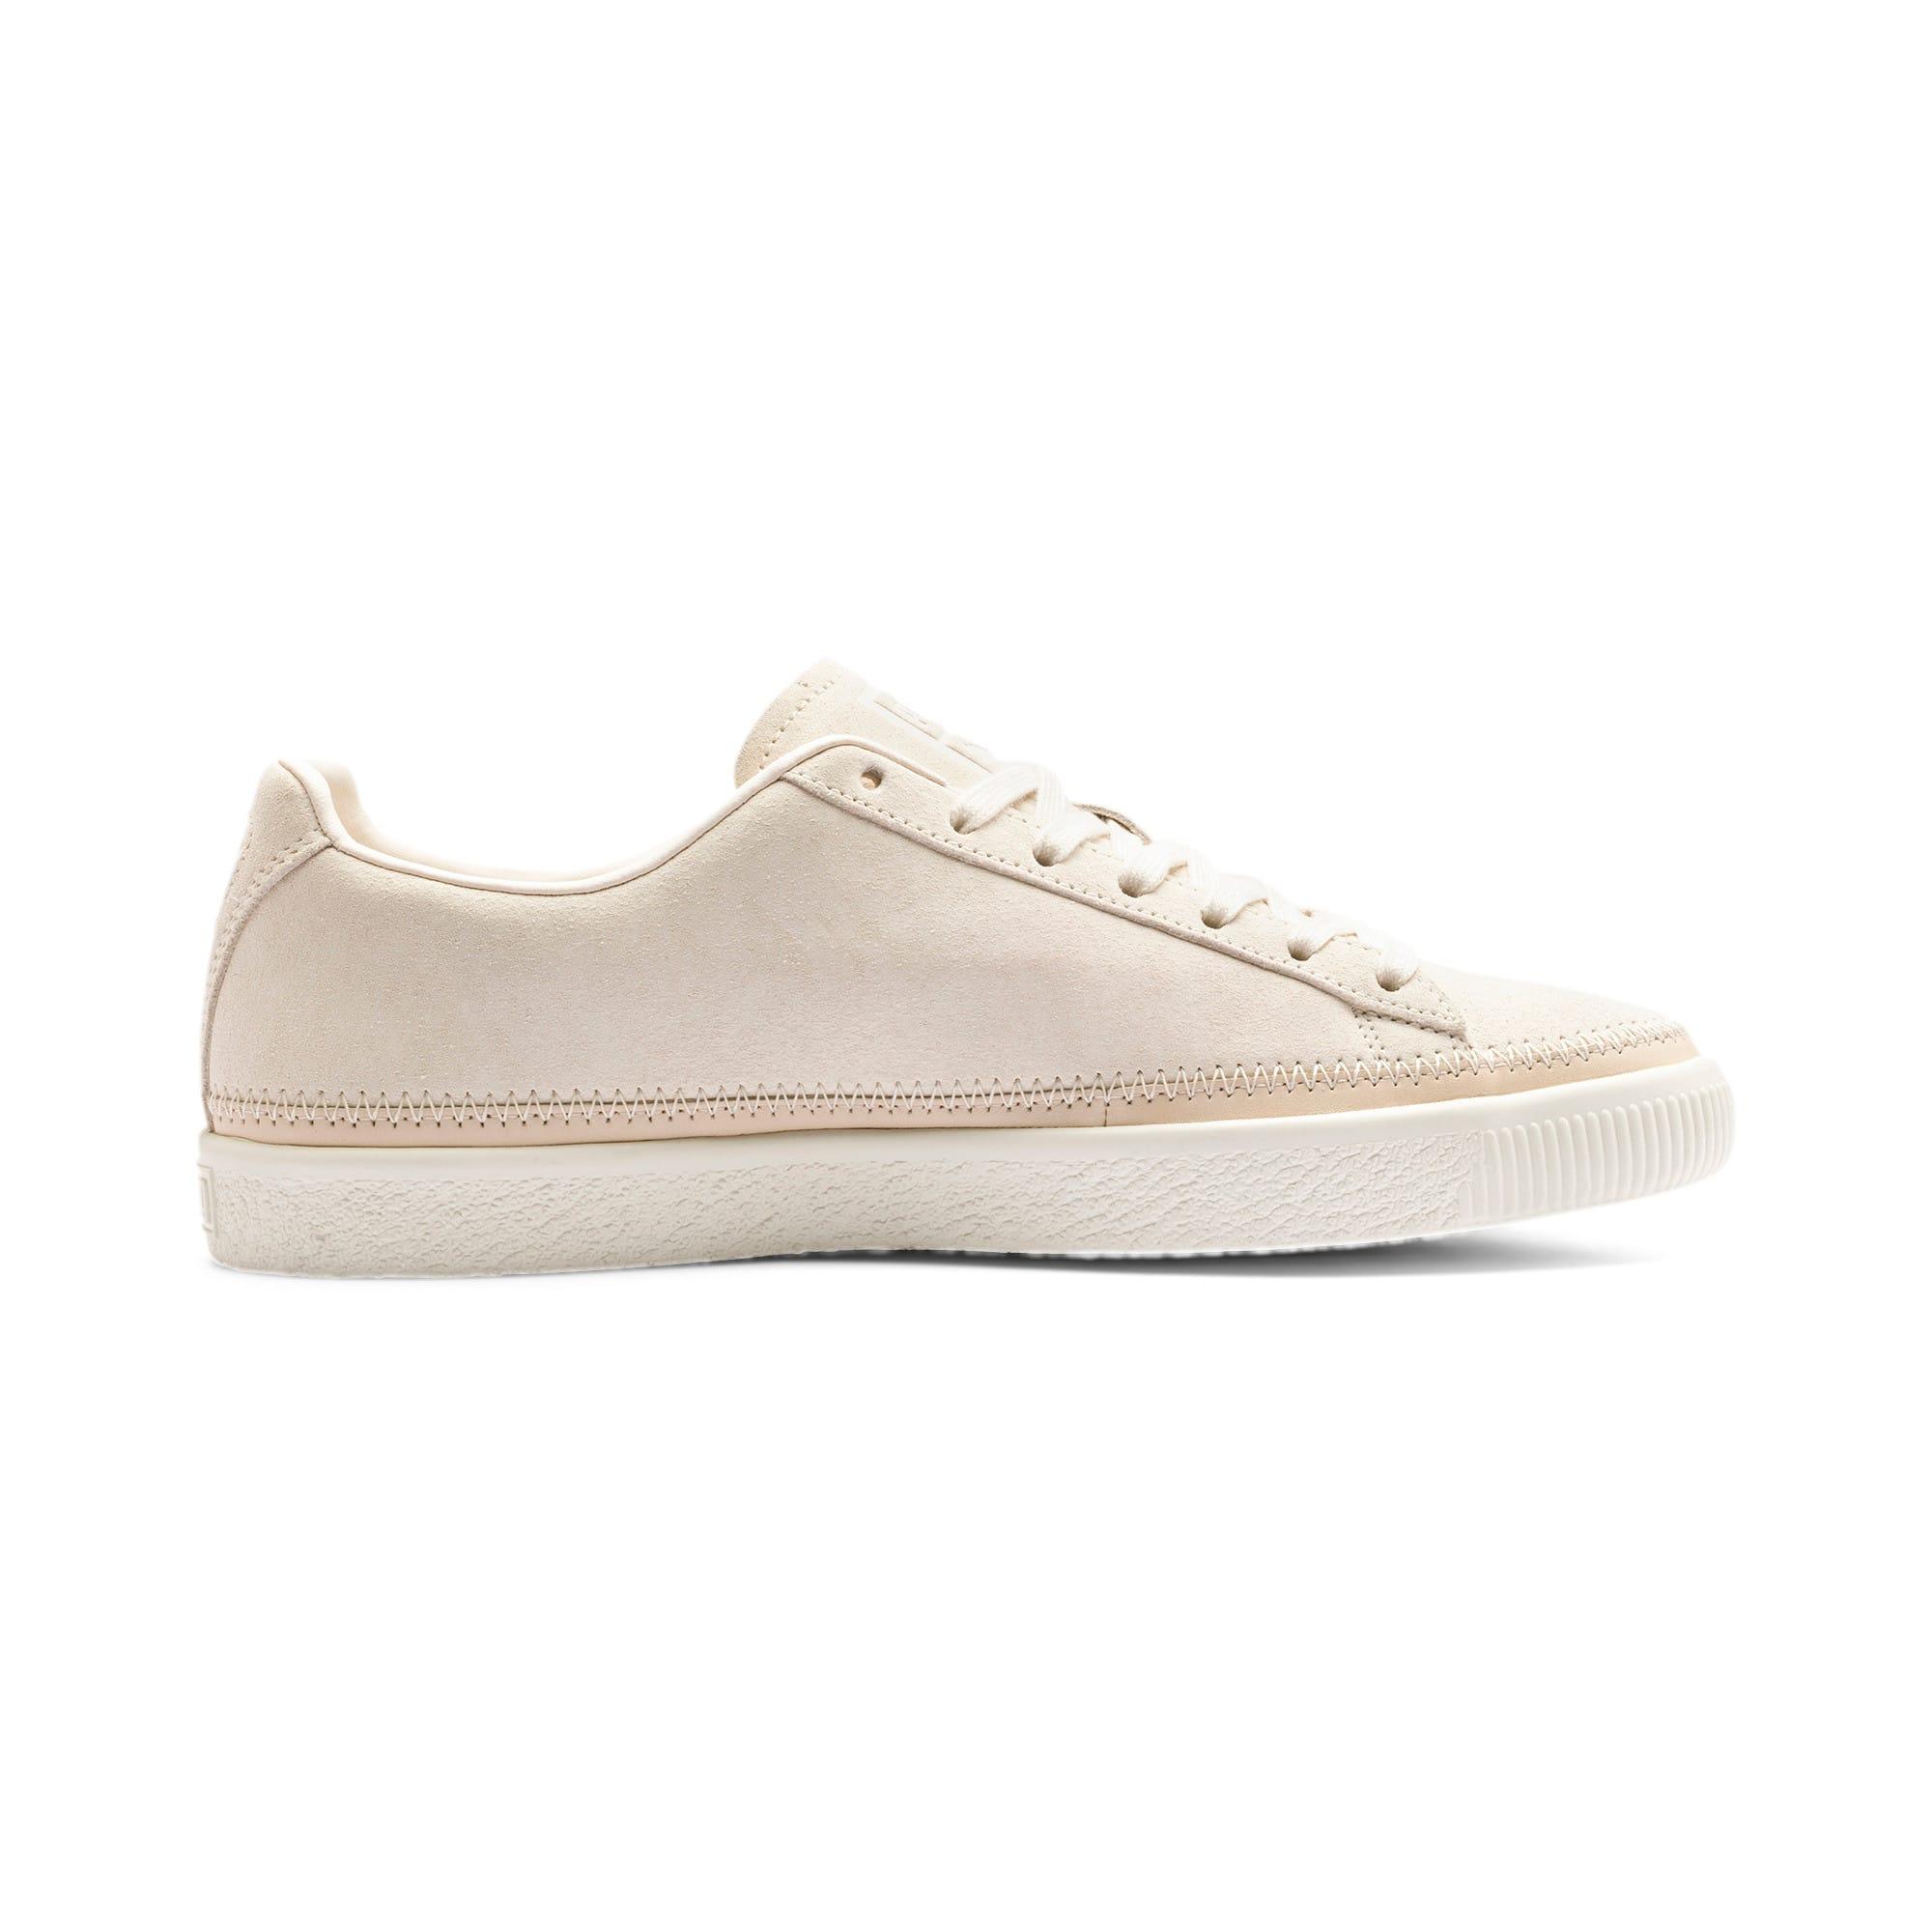 Miniatura 6 de Zapatos deportivos Suede Trim PRM, White Smoke-Whisper White, mediano